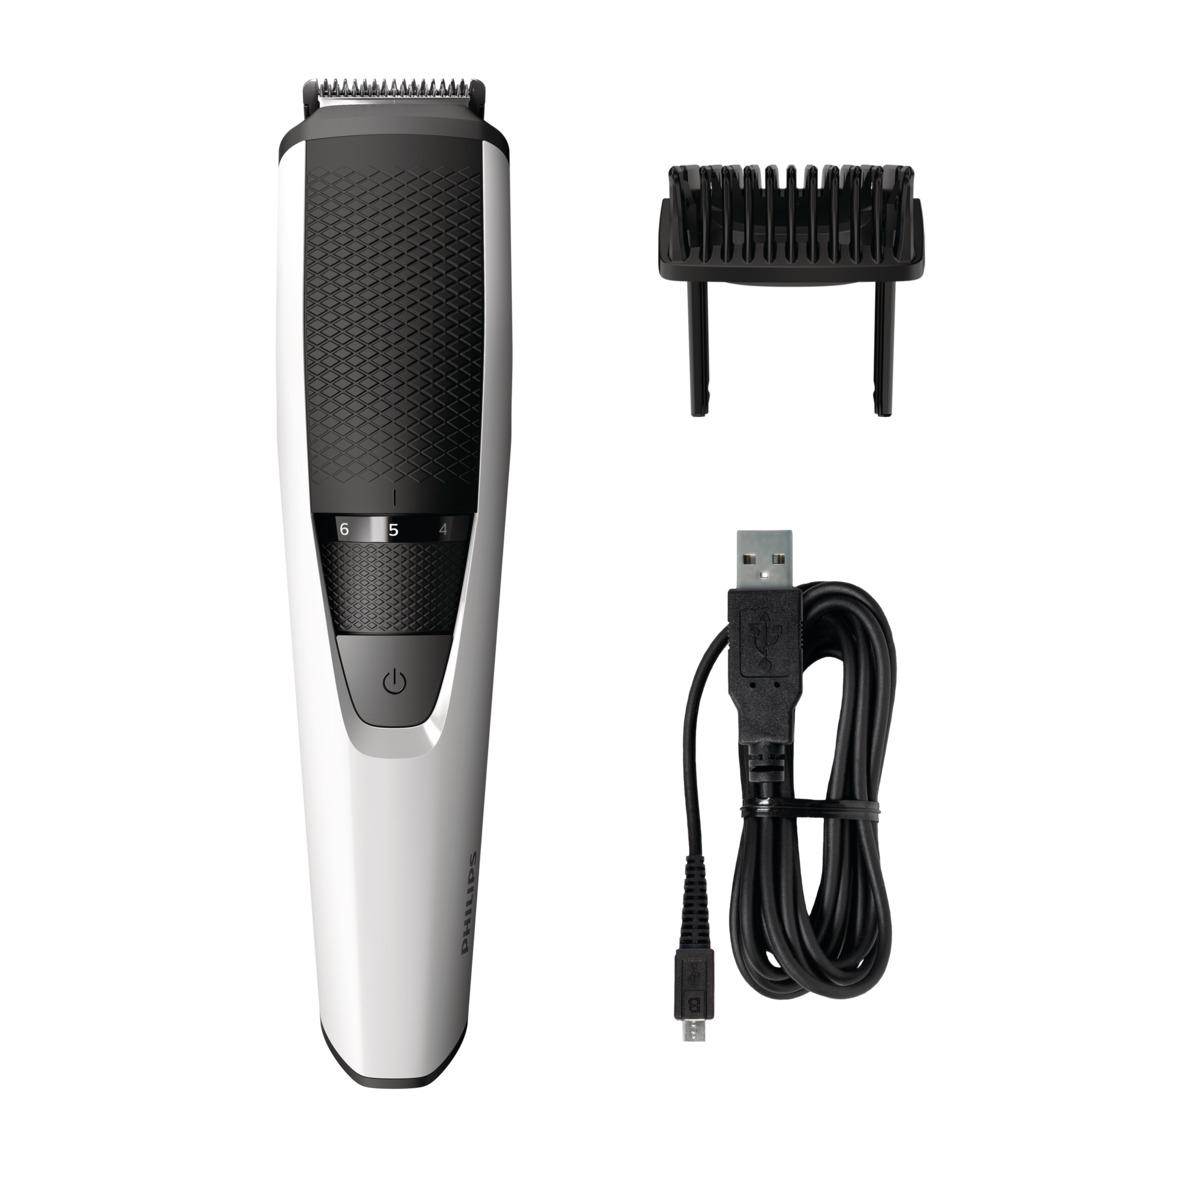 Триммер для бороды и усов Philips Series 3000 BT3202/14, Silver Black